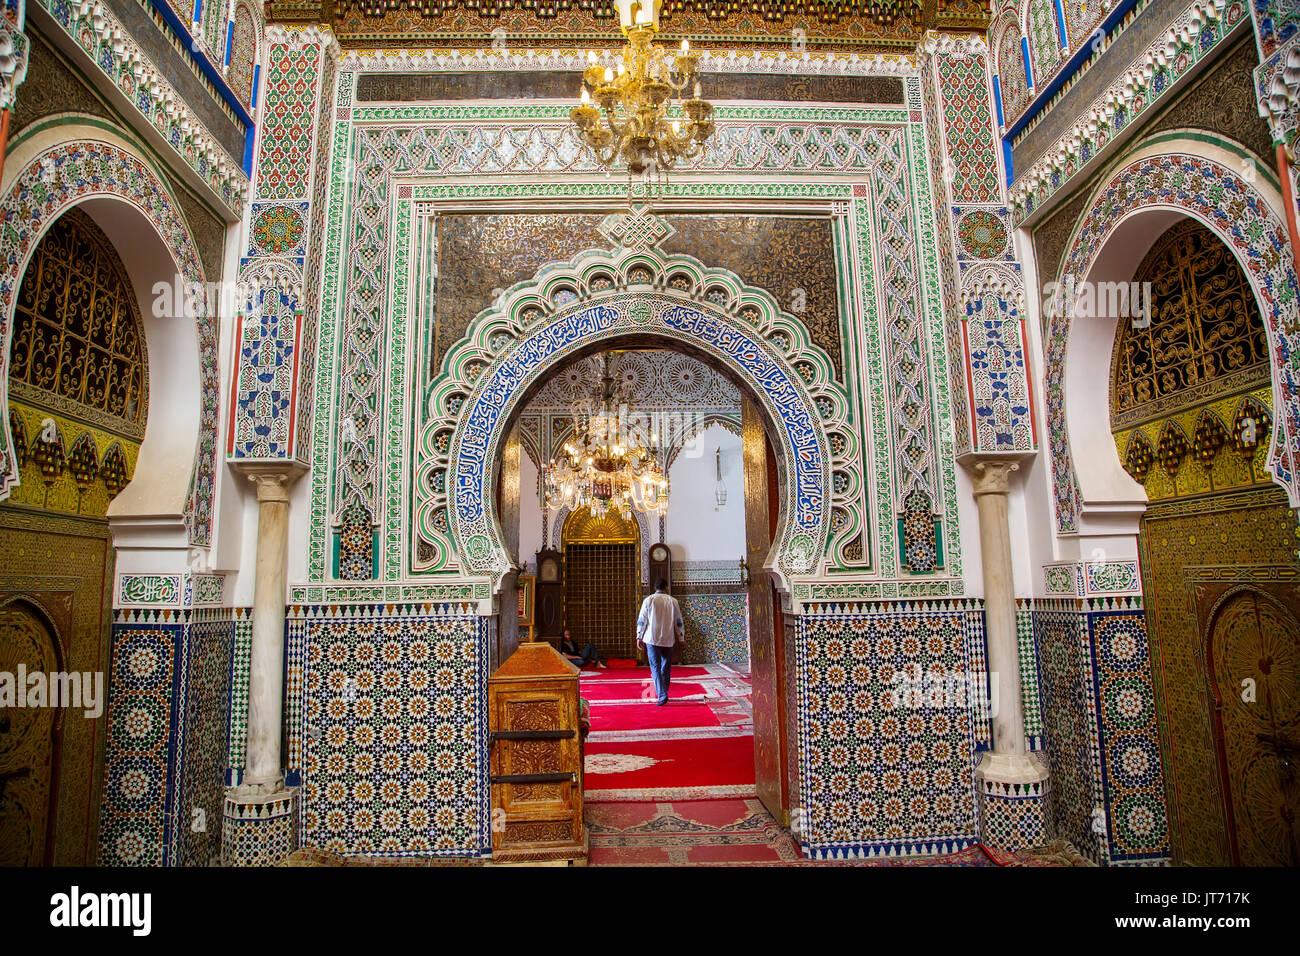 Moulay Idriss II.-Moschee. Souk Medina von Fes, Fes el Bali. Marokko, Maghreb Nordafrika Stockfoto